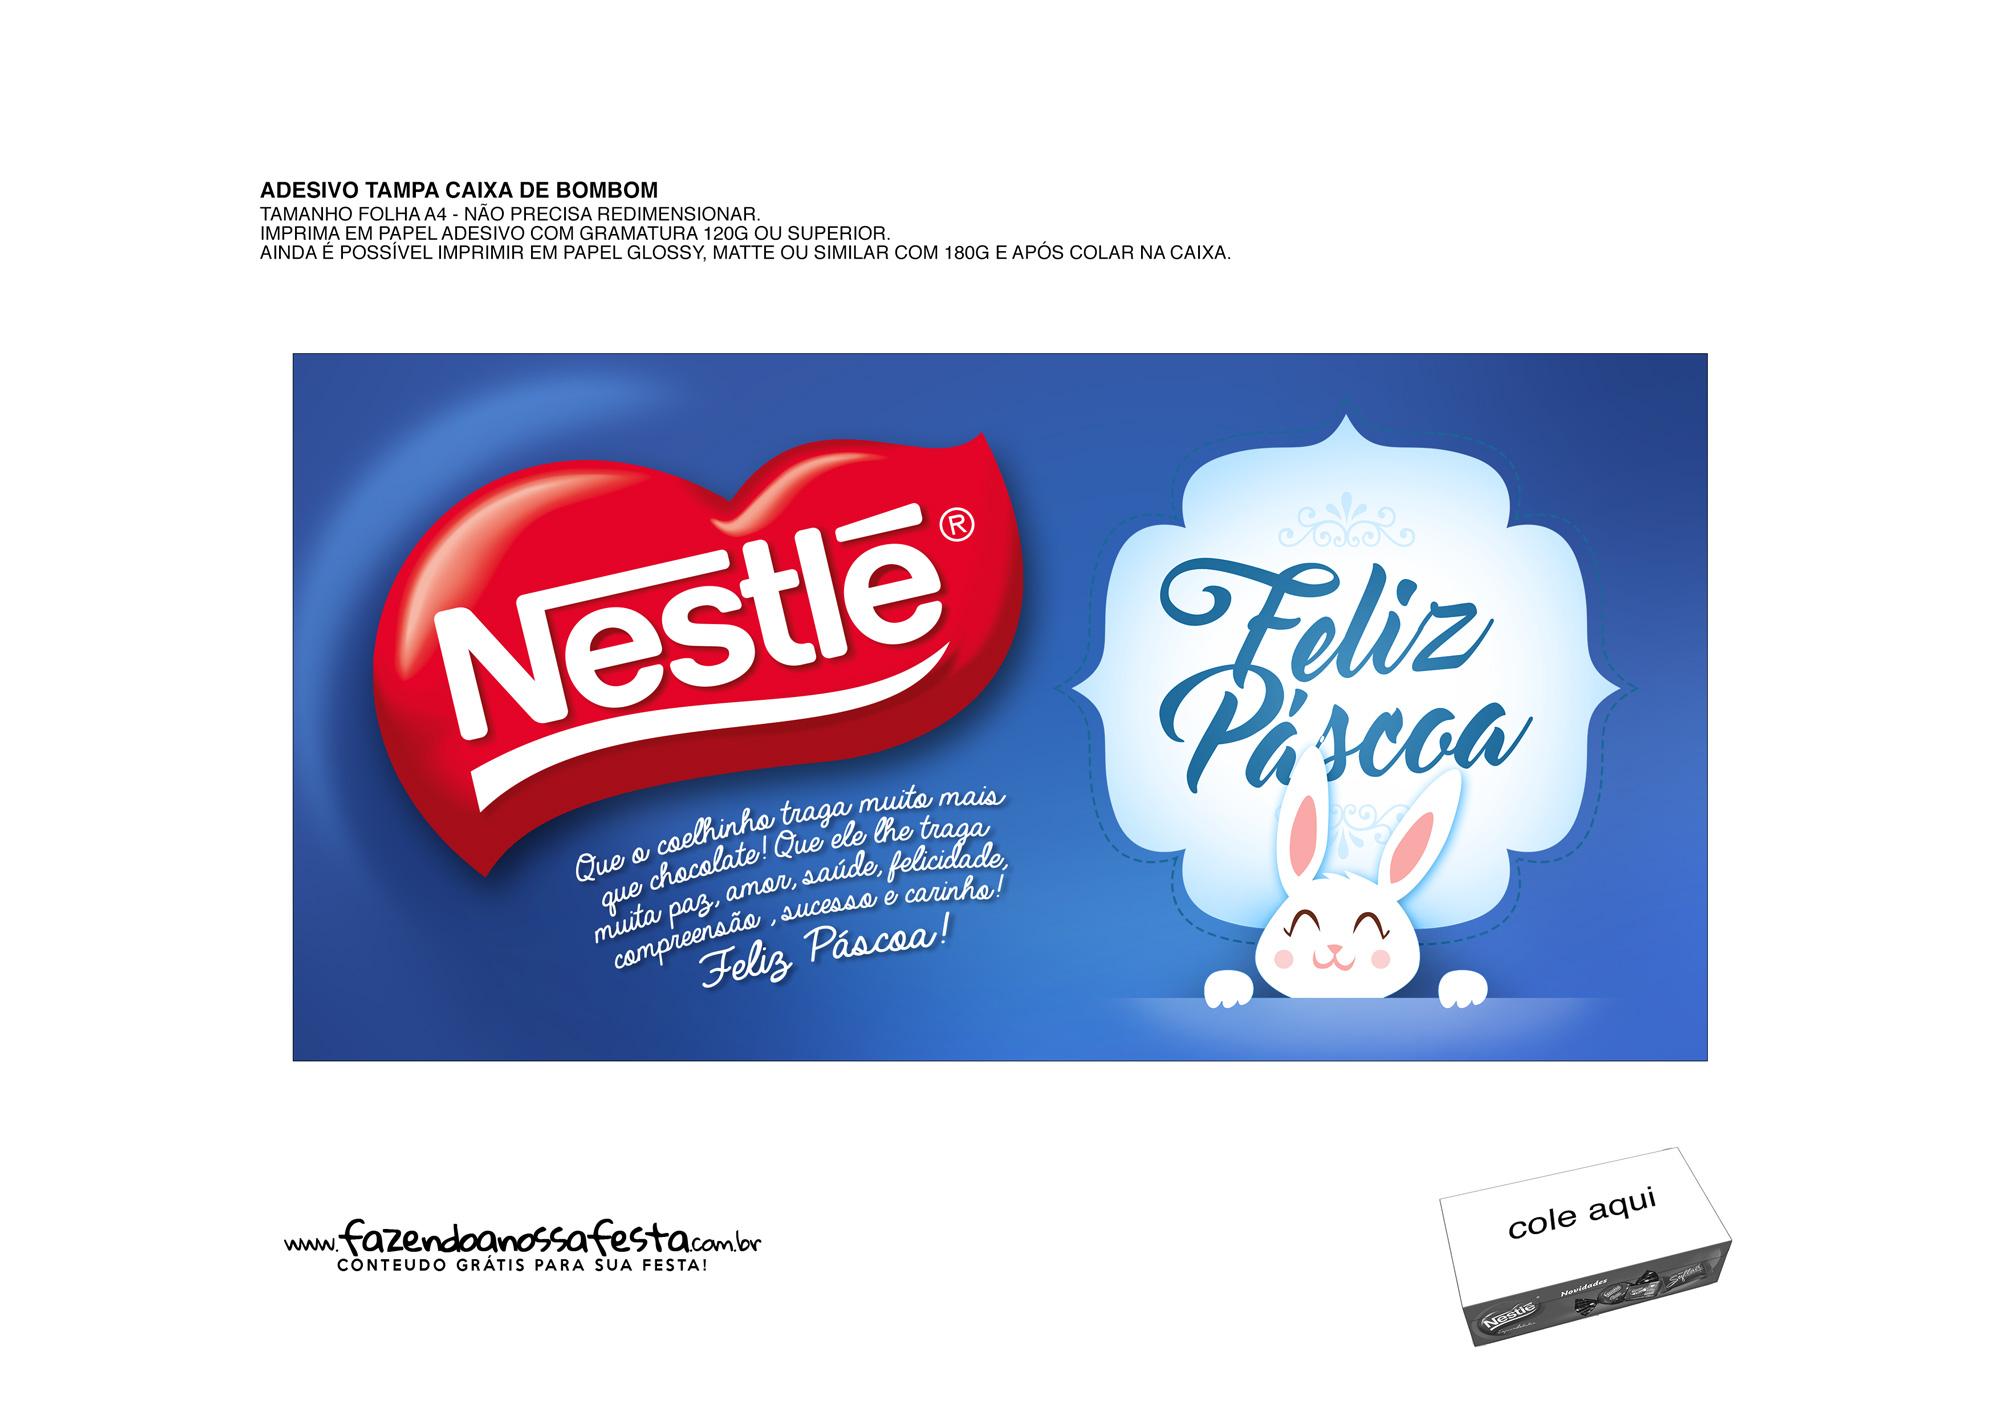 Adesivo para Caixa Bombom de Páscoa Nestlé